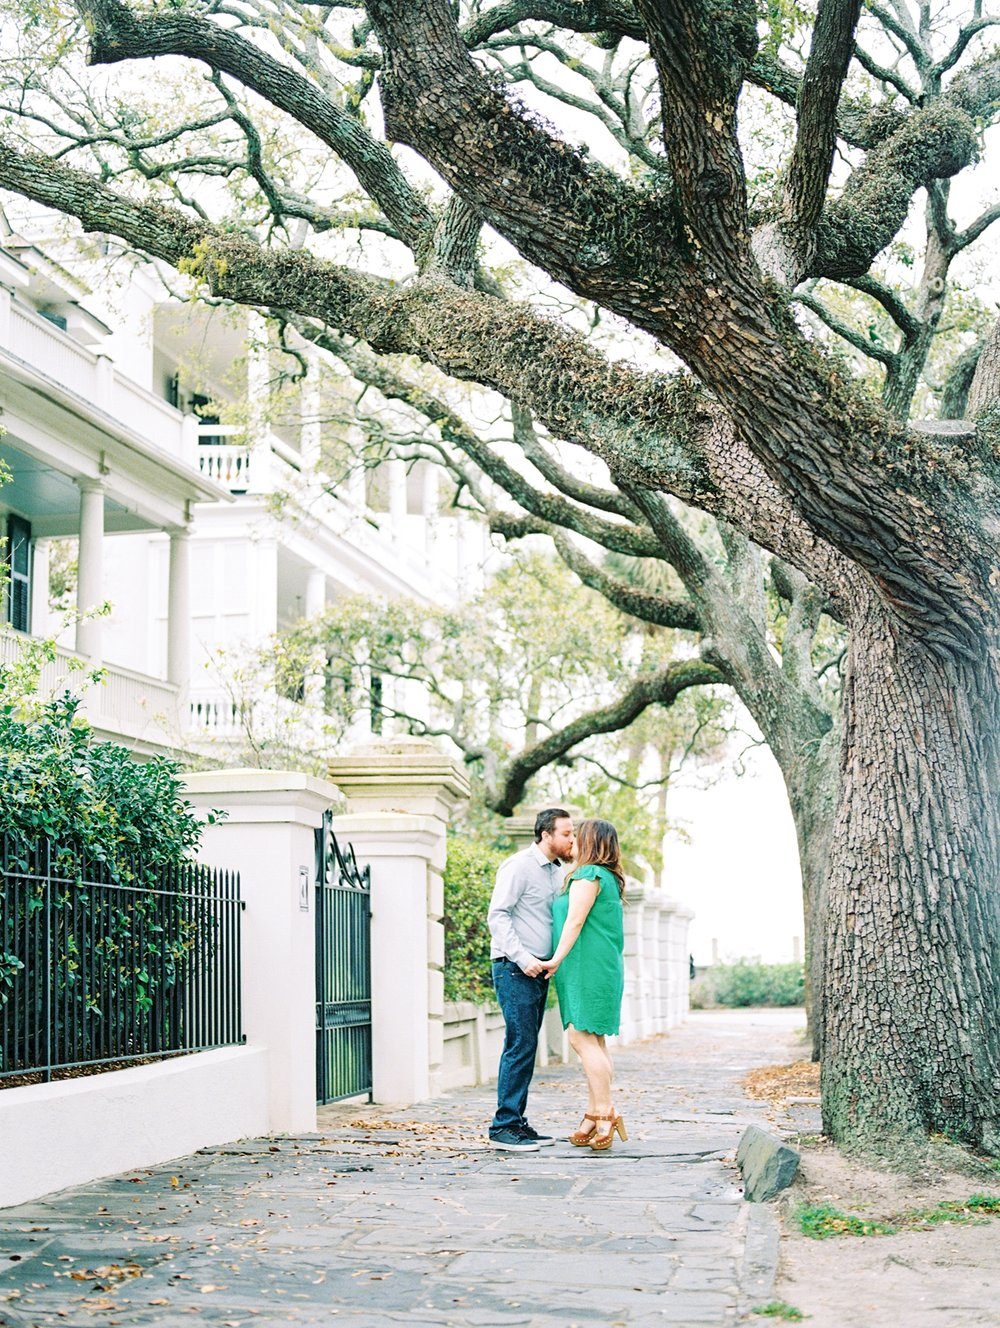 Lisa Silva Photography- Ponte Vedra Beach and Jacksonville, Florida Fine Art Film Wedding Photography- Engagement Session in Historic Charleston, South Carolina_0003.jpg